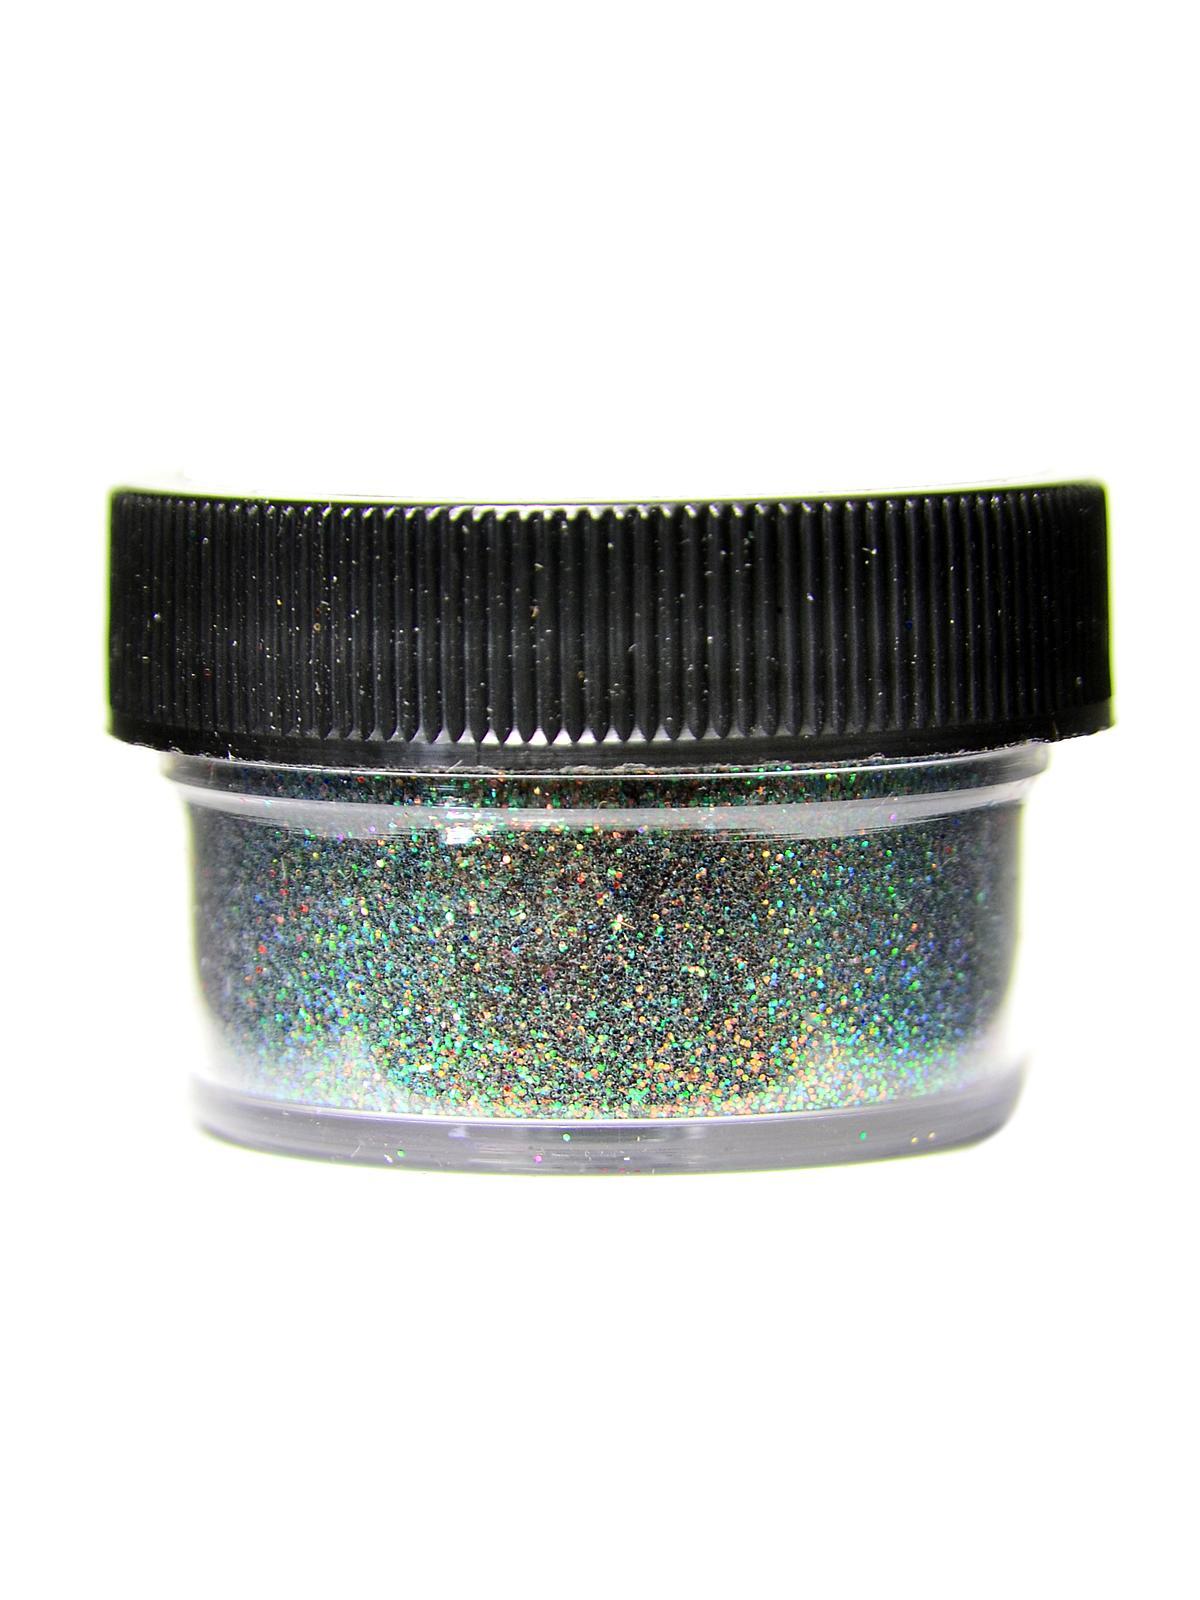 Ultrafine Transparent Glitter Green Briar 1 2 Oz. Jar